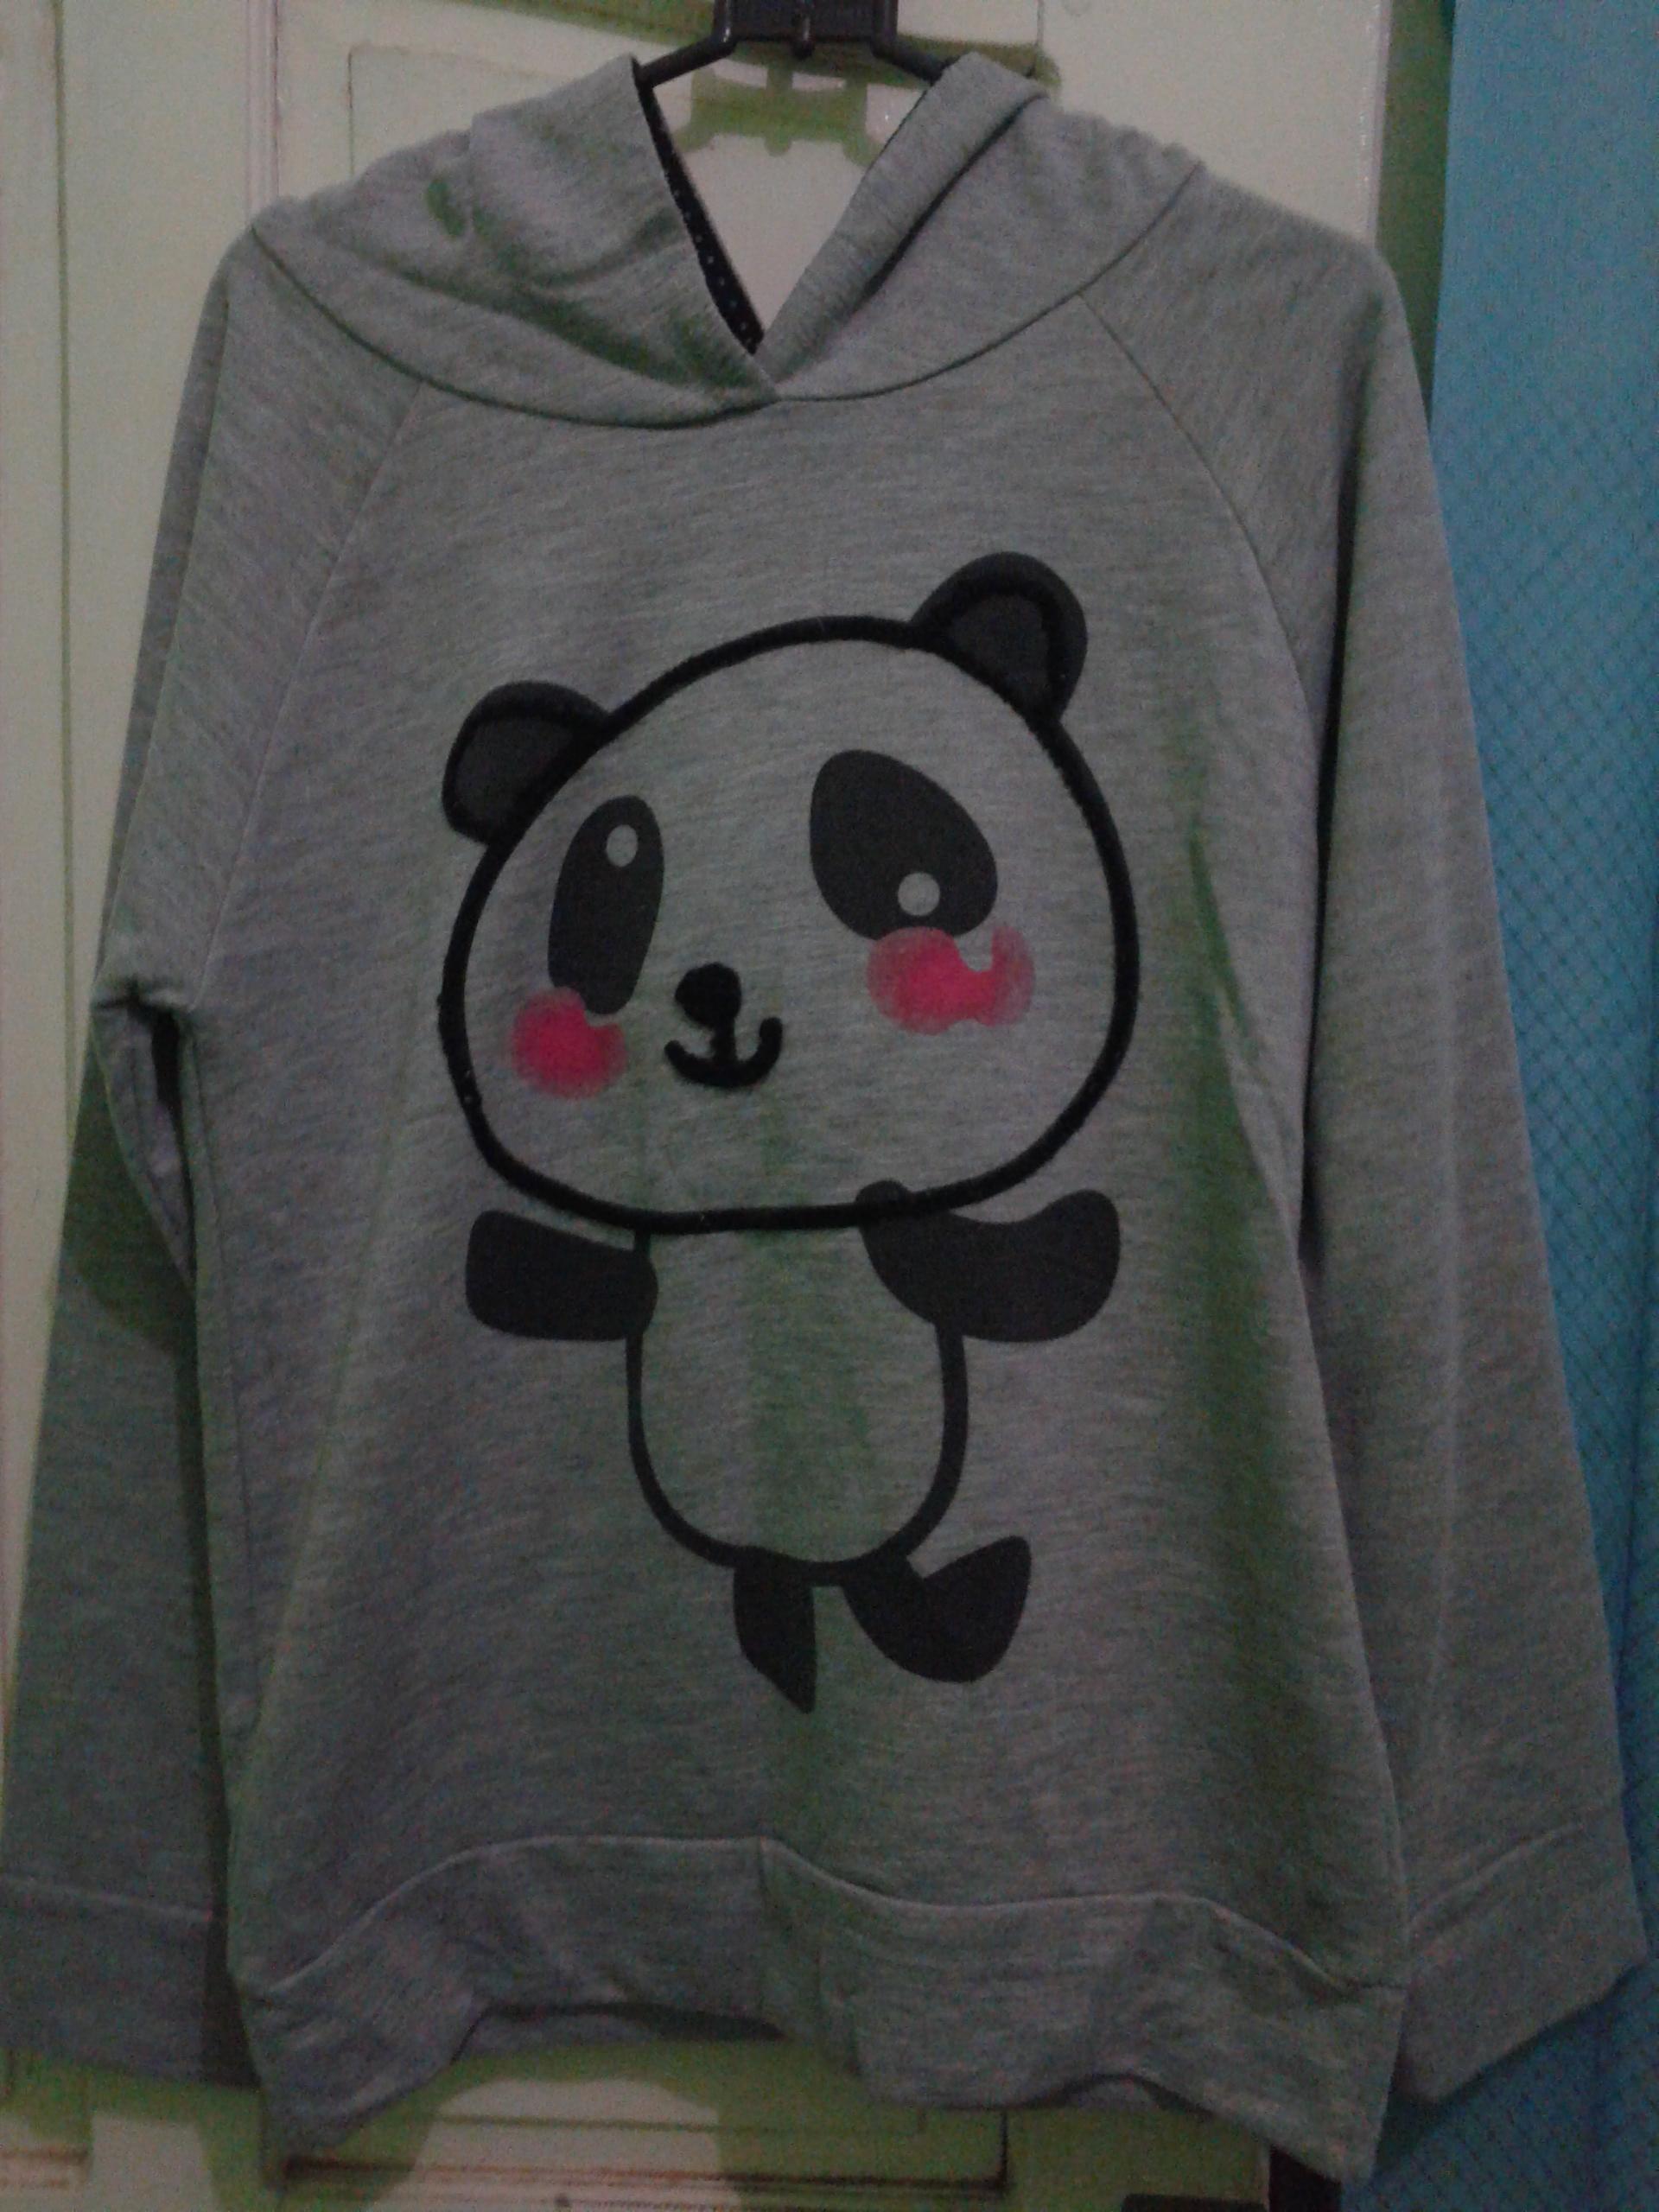 jaket/ sweater nevada panda lucu